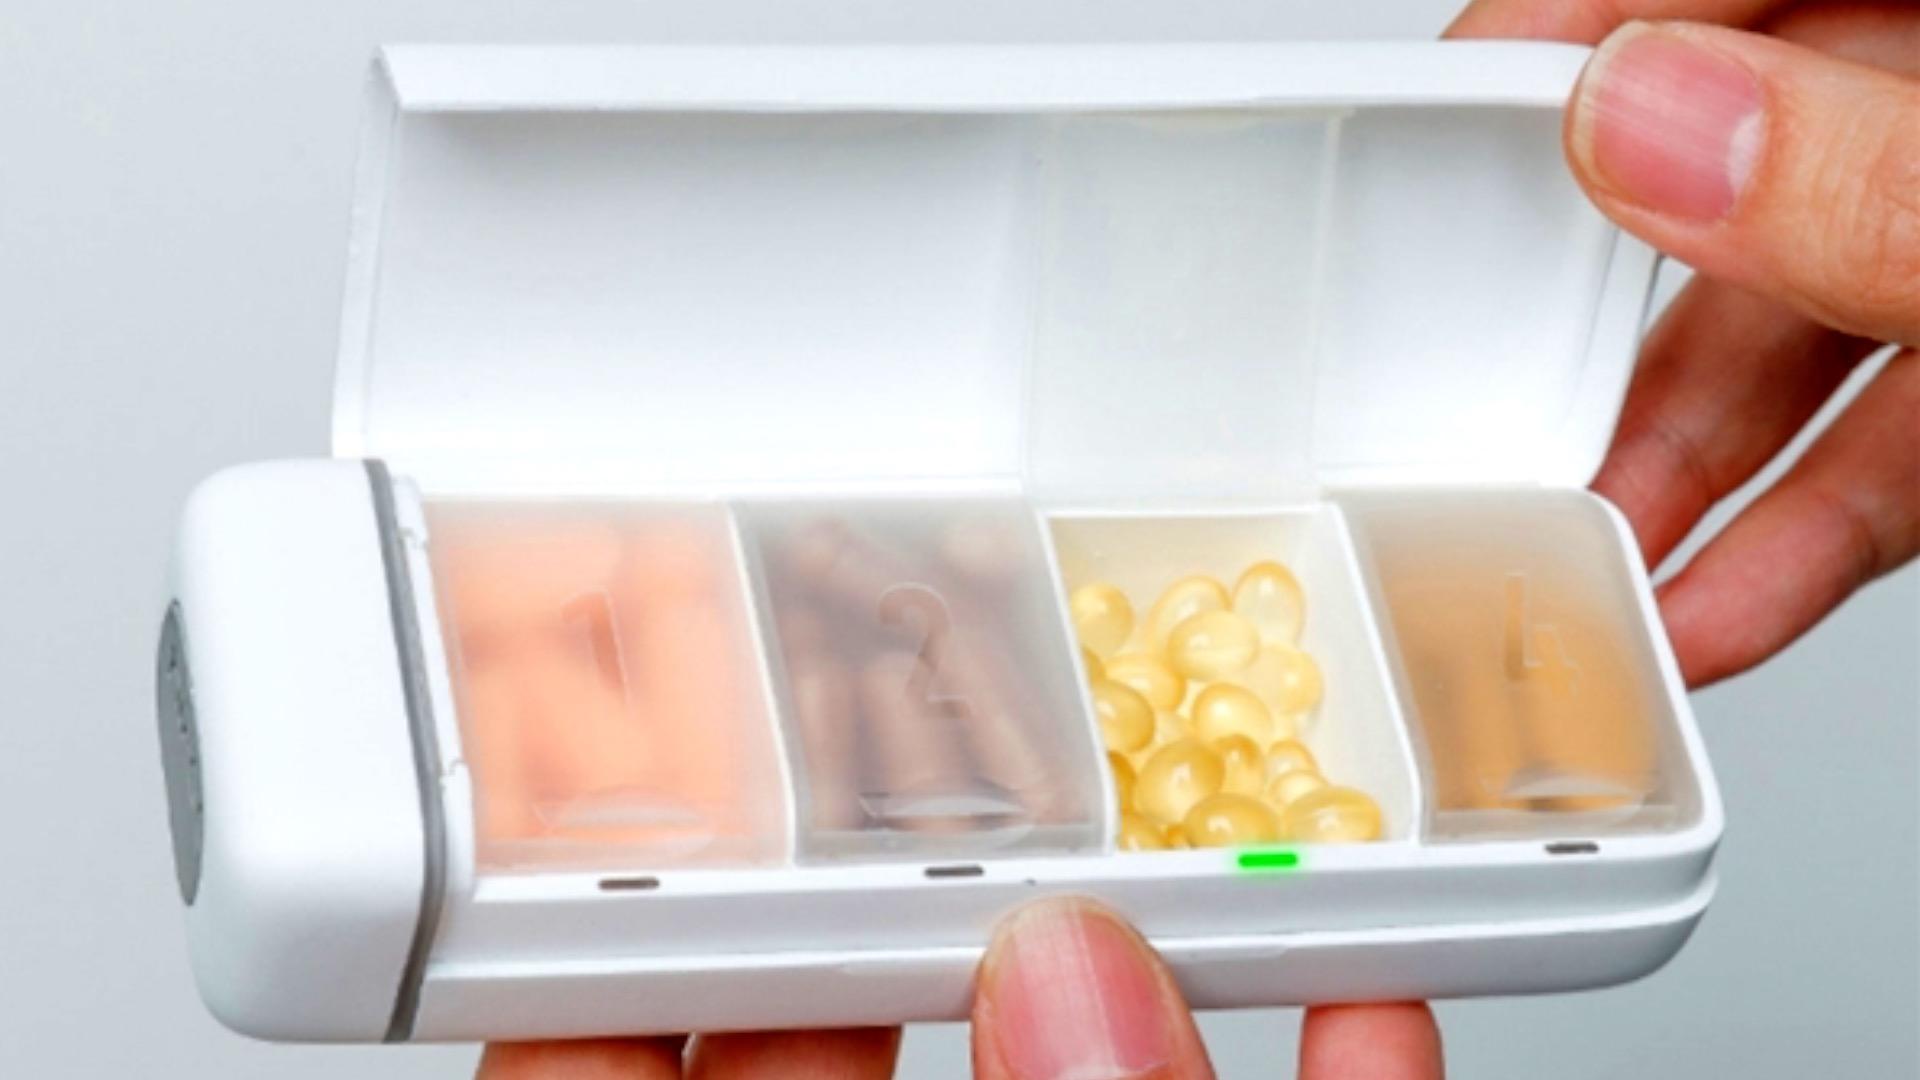 Kit de saúde inteligente Xiaomi HiPee